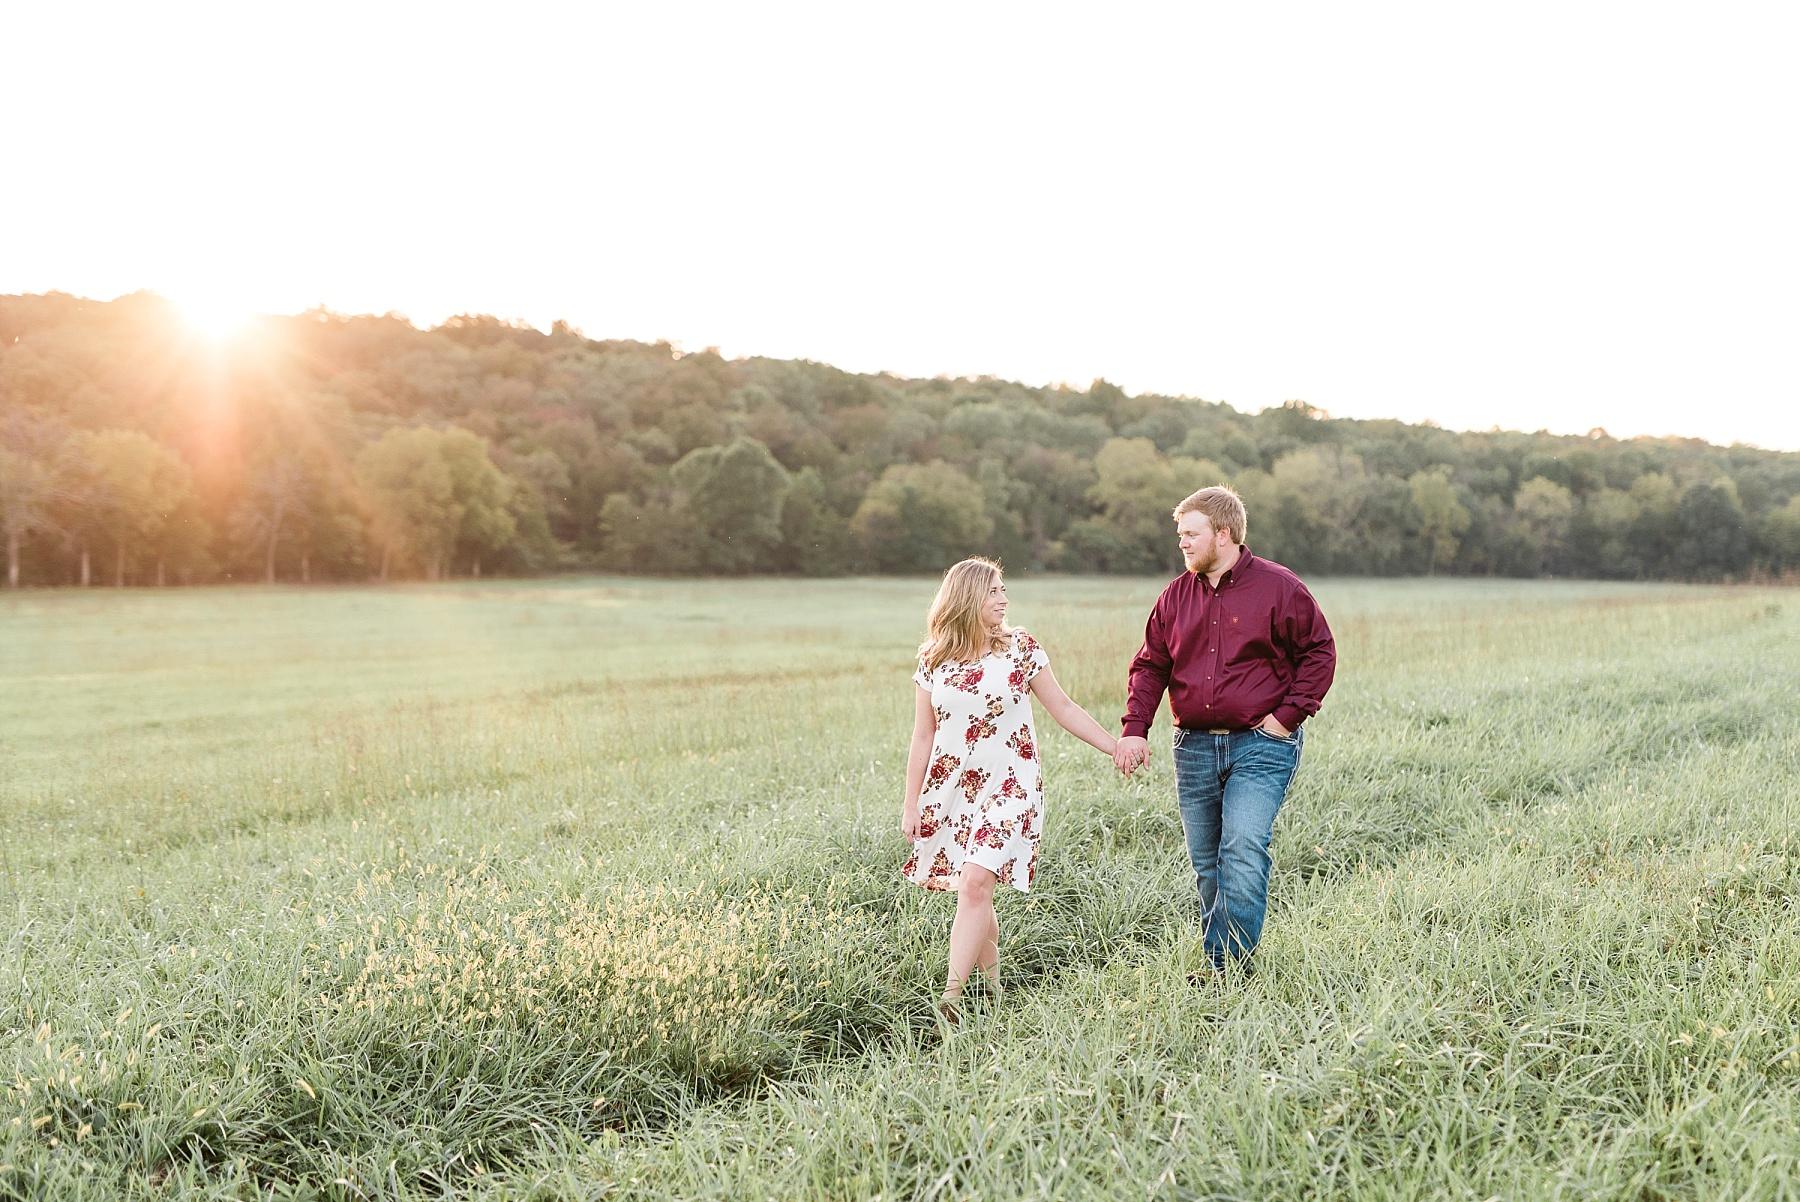 Autumn Golden Sunset Engagement Session on Farm in Missouri by Kelsi Kliethermes Photography_0003.jpg